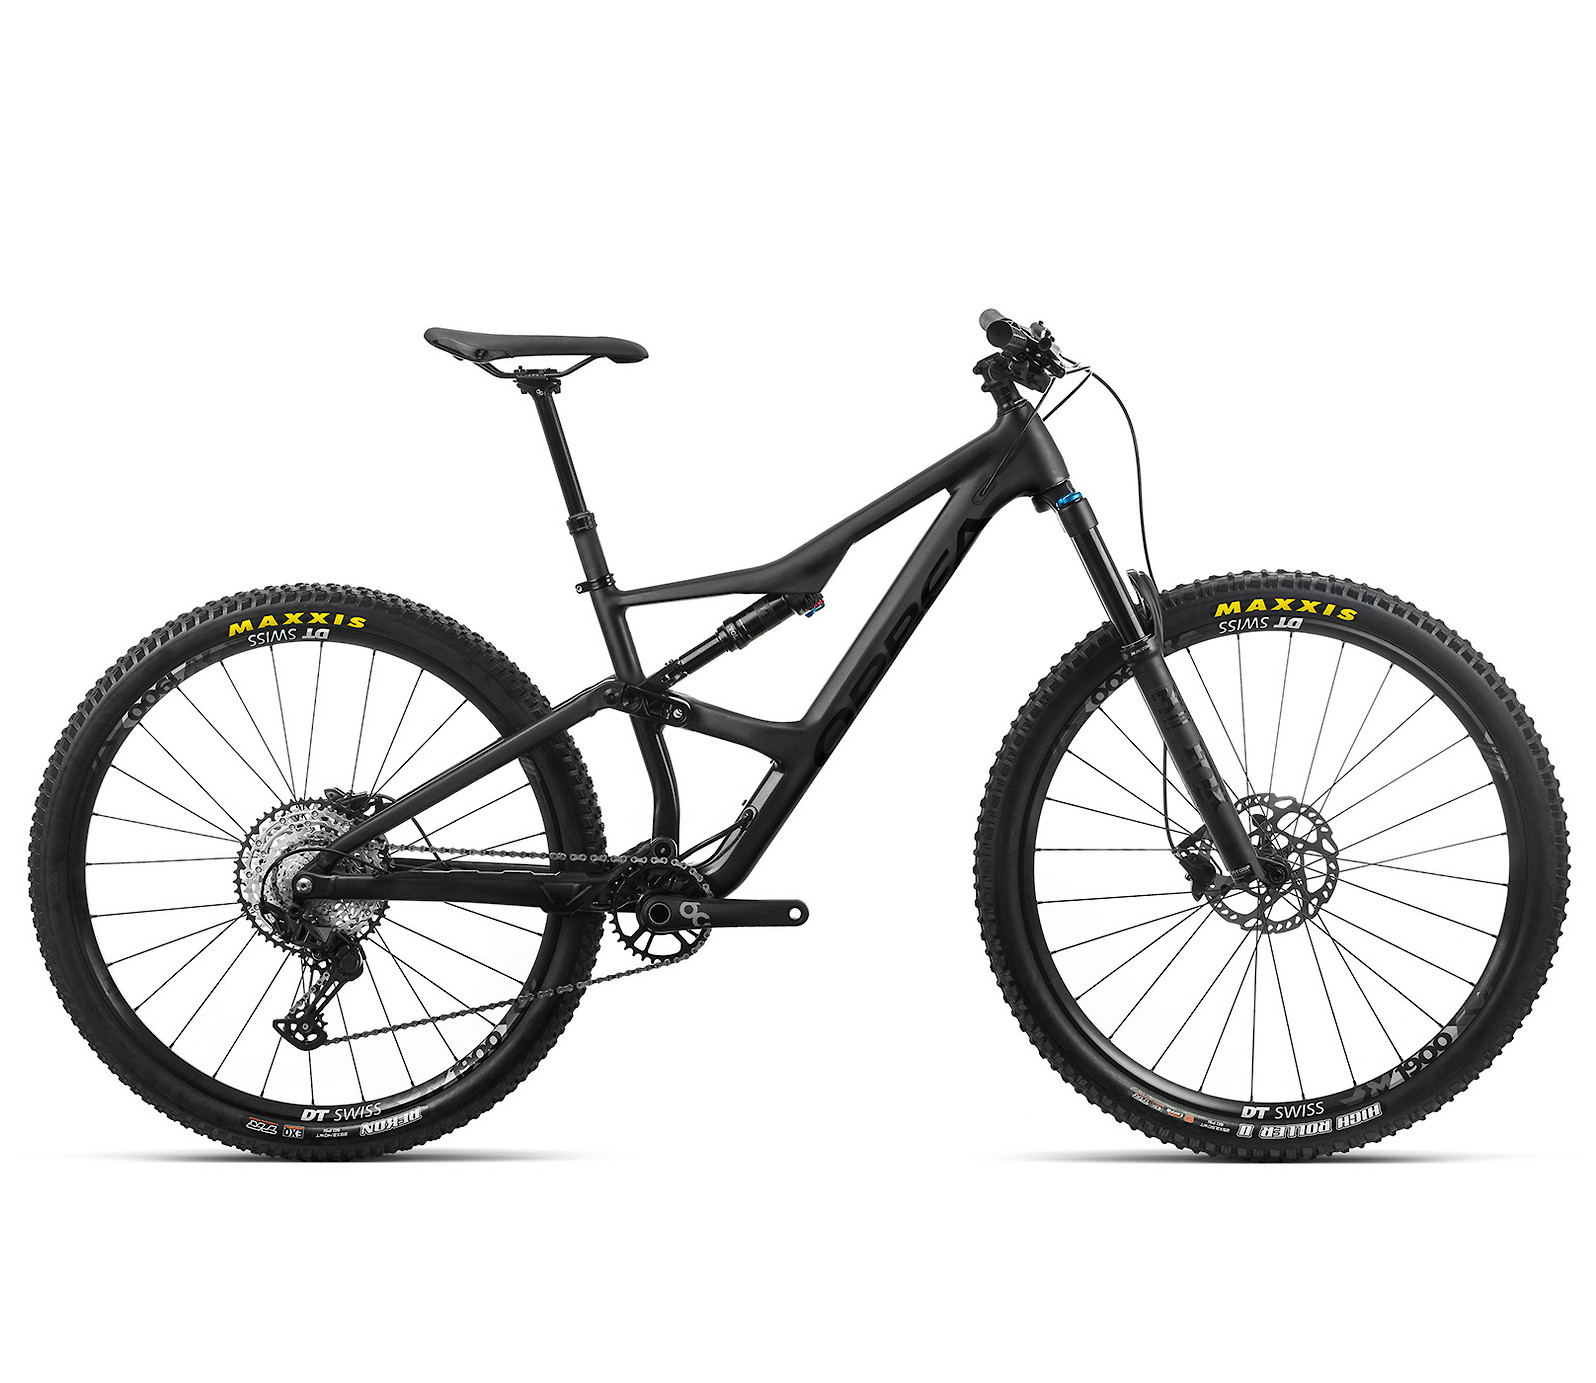 2020 Orbea Ocam H30 in metallic black (with optional equipment)